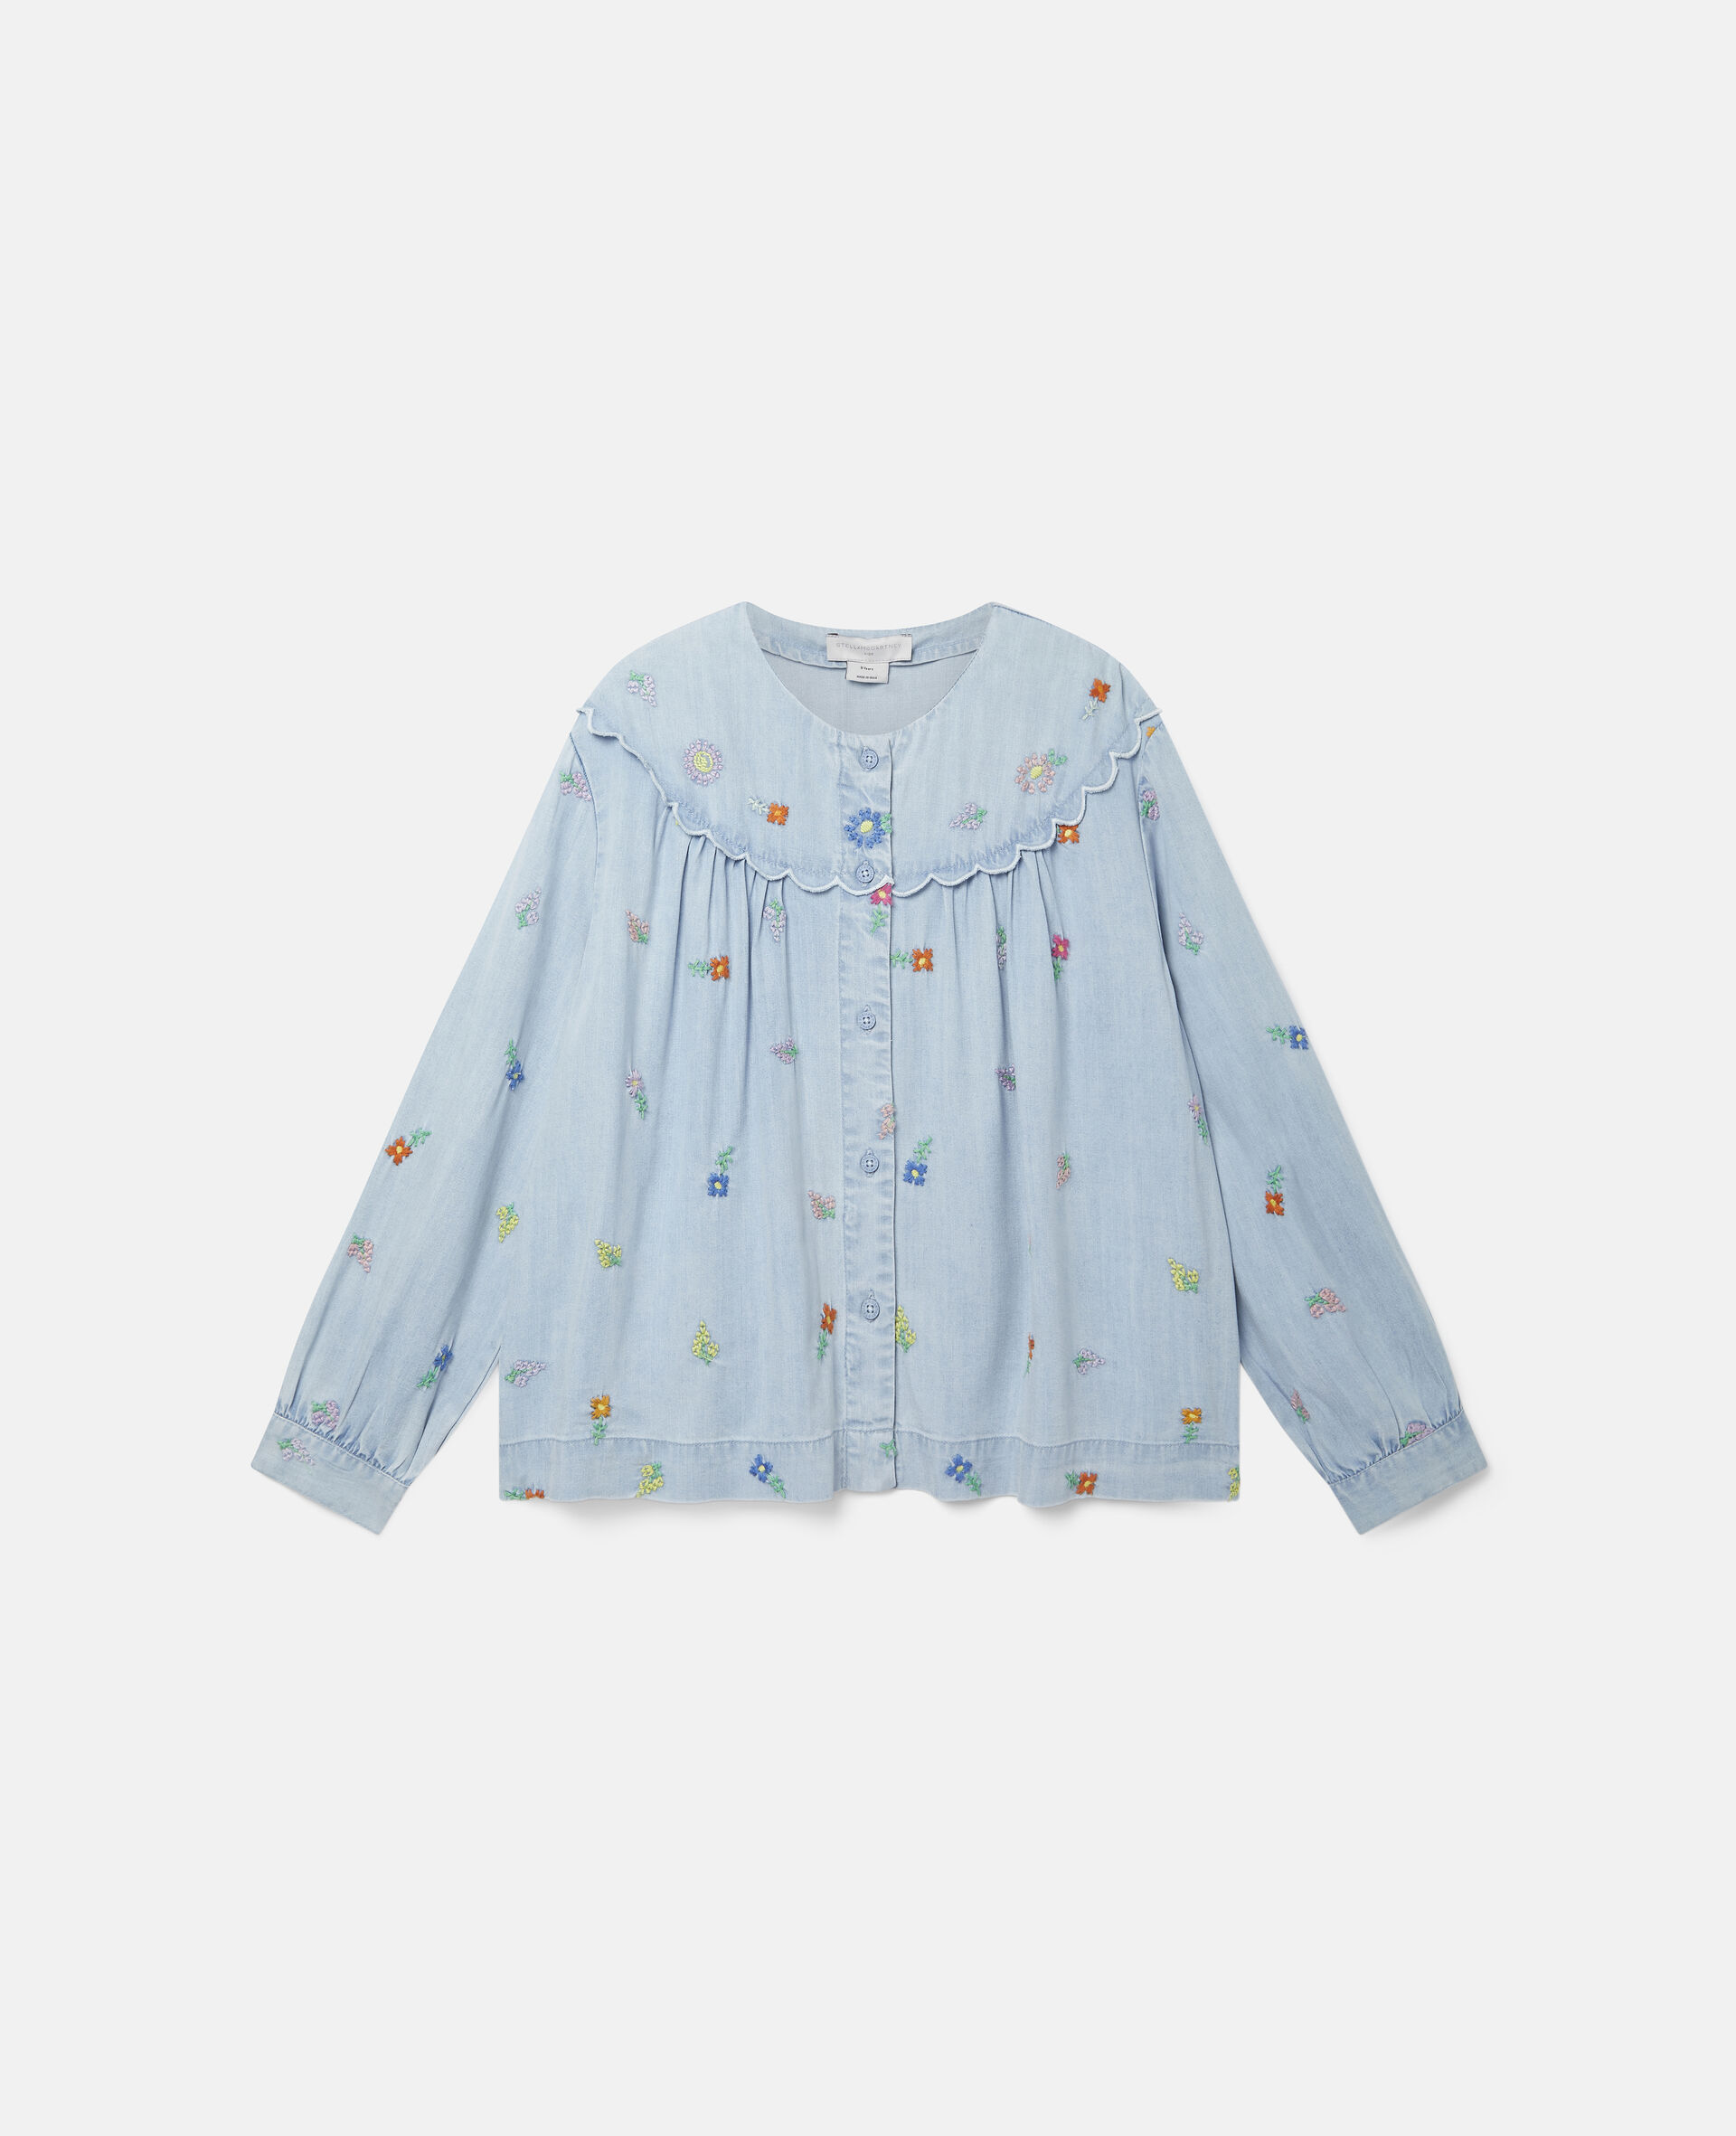 Embroidered Flowers Denim Shirt-Blue-large image number 0